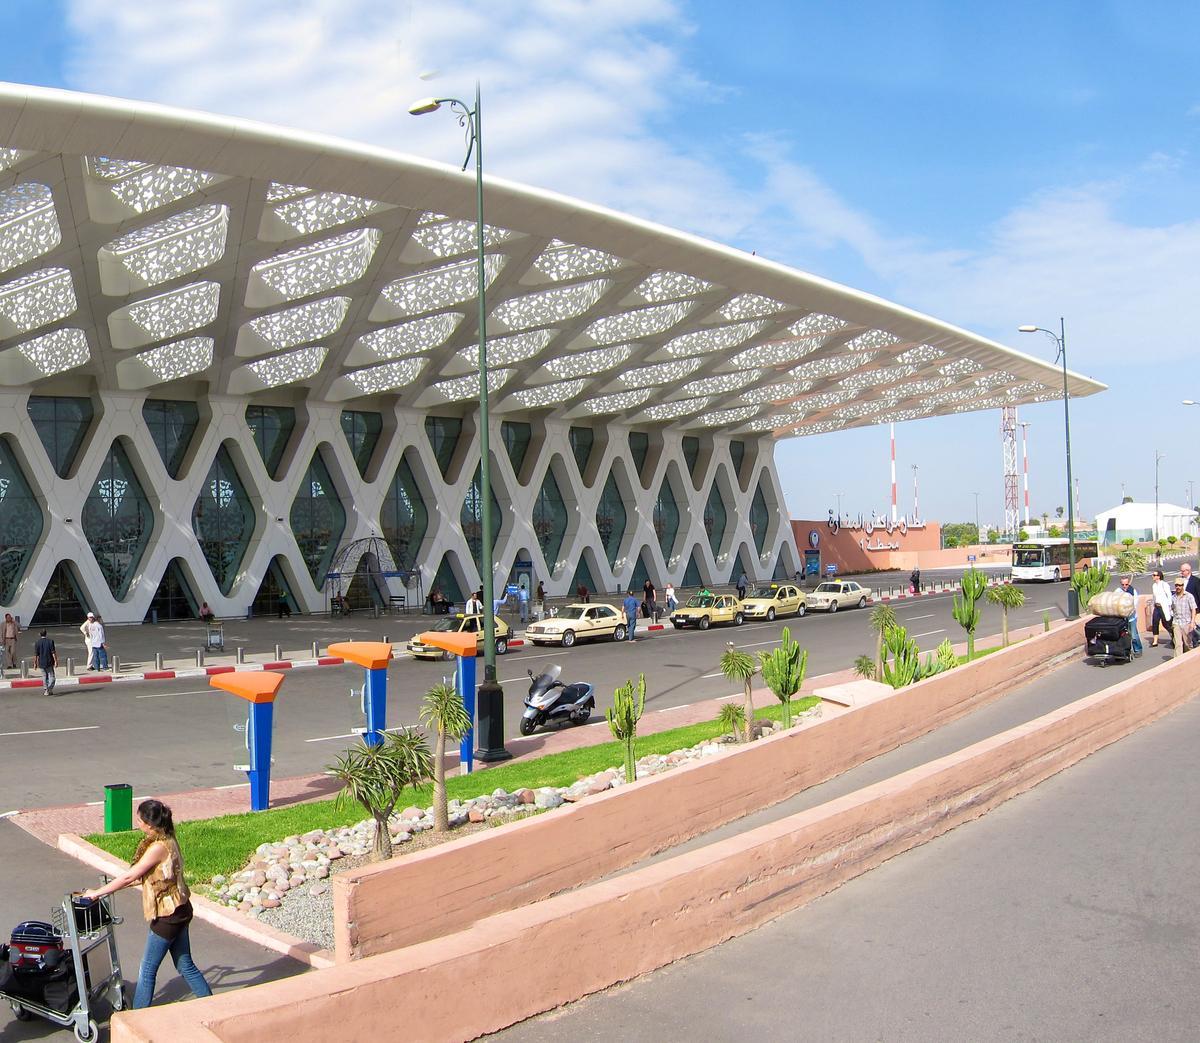 Aeroports Marrakech Menara Respecte L Environnement Construction21